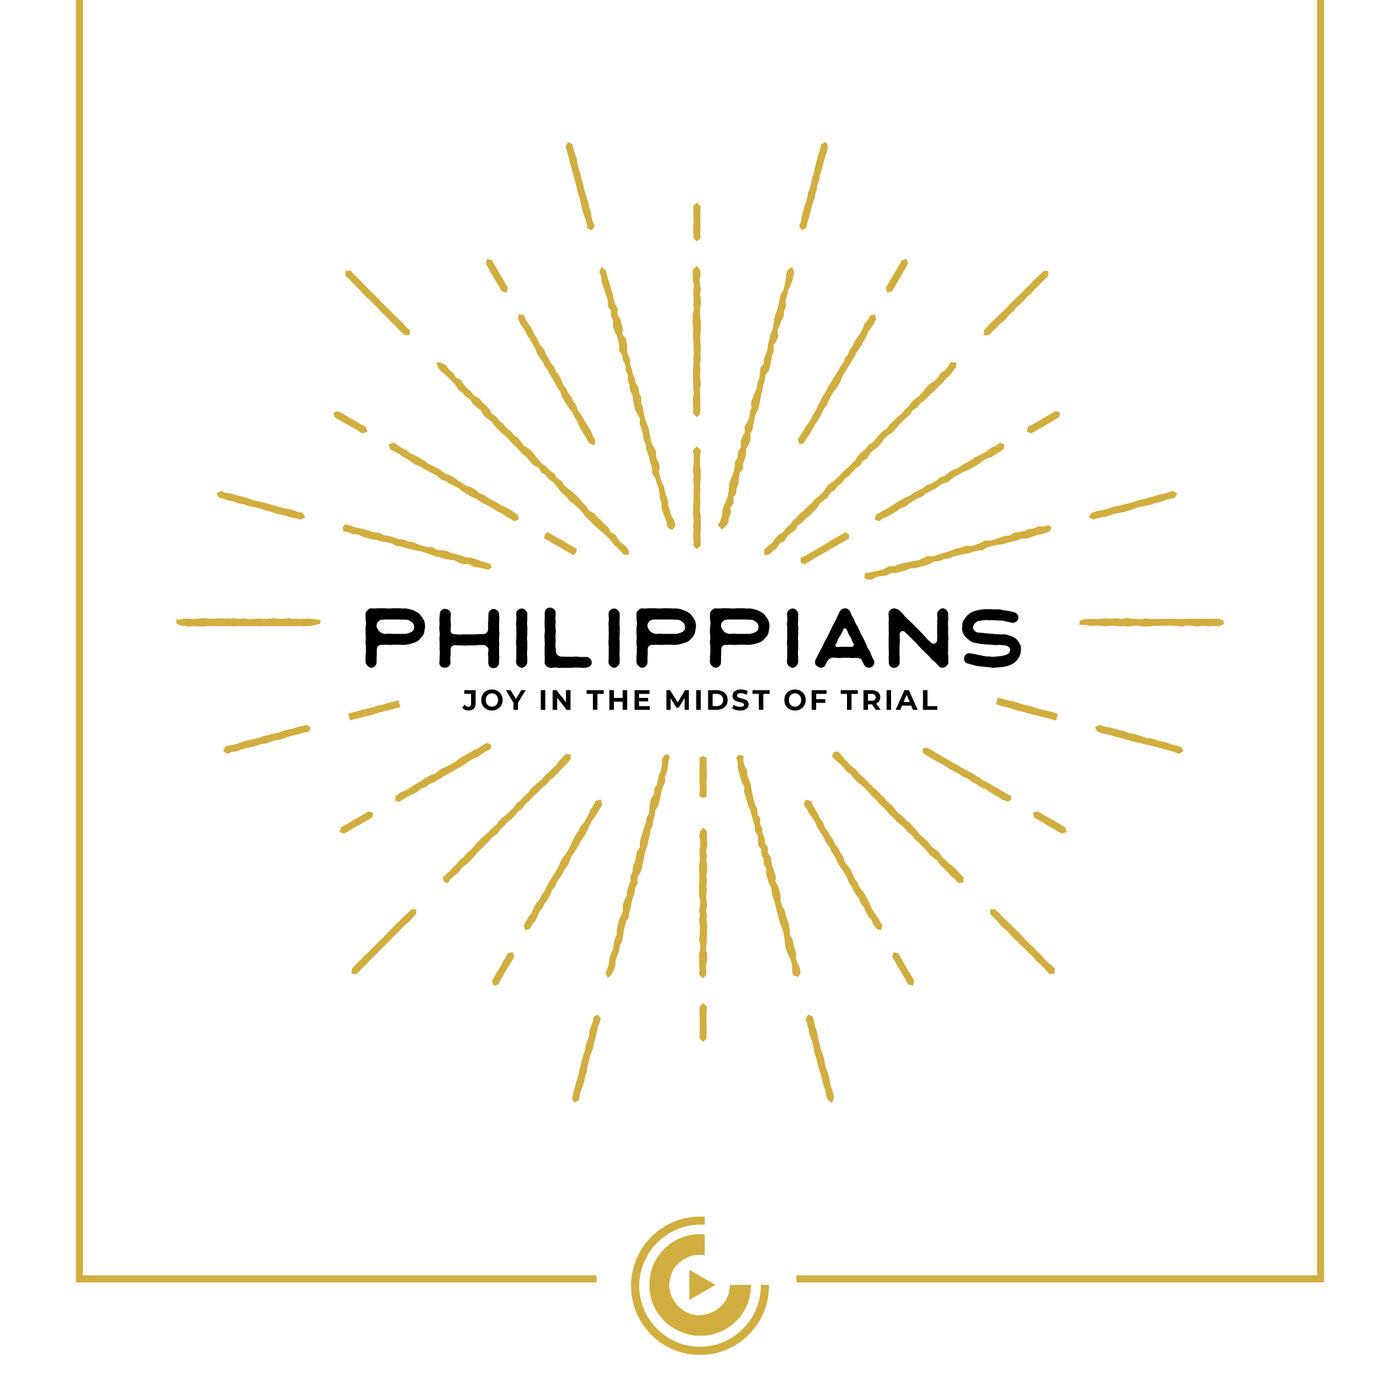 Christ Church Media Bible Study: Philippians 1:18-26